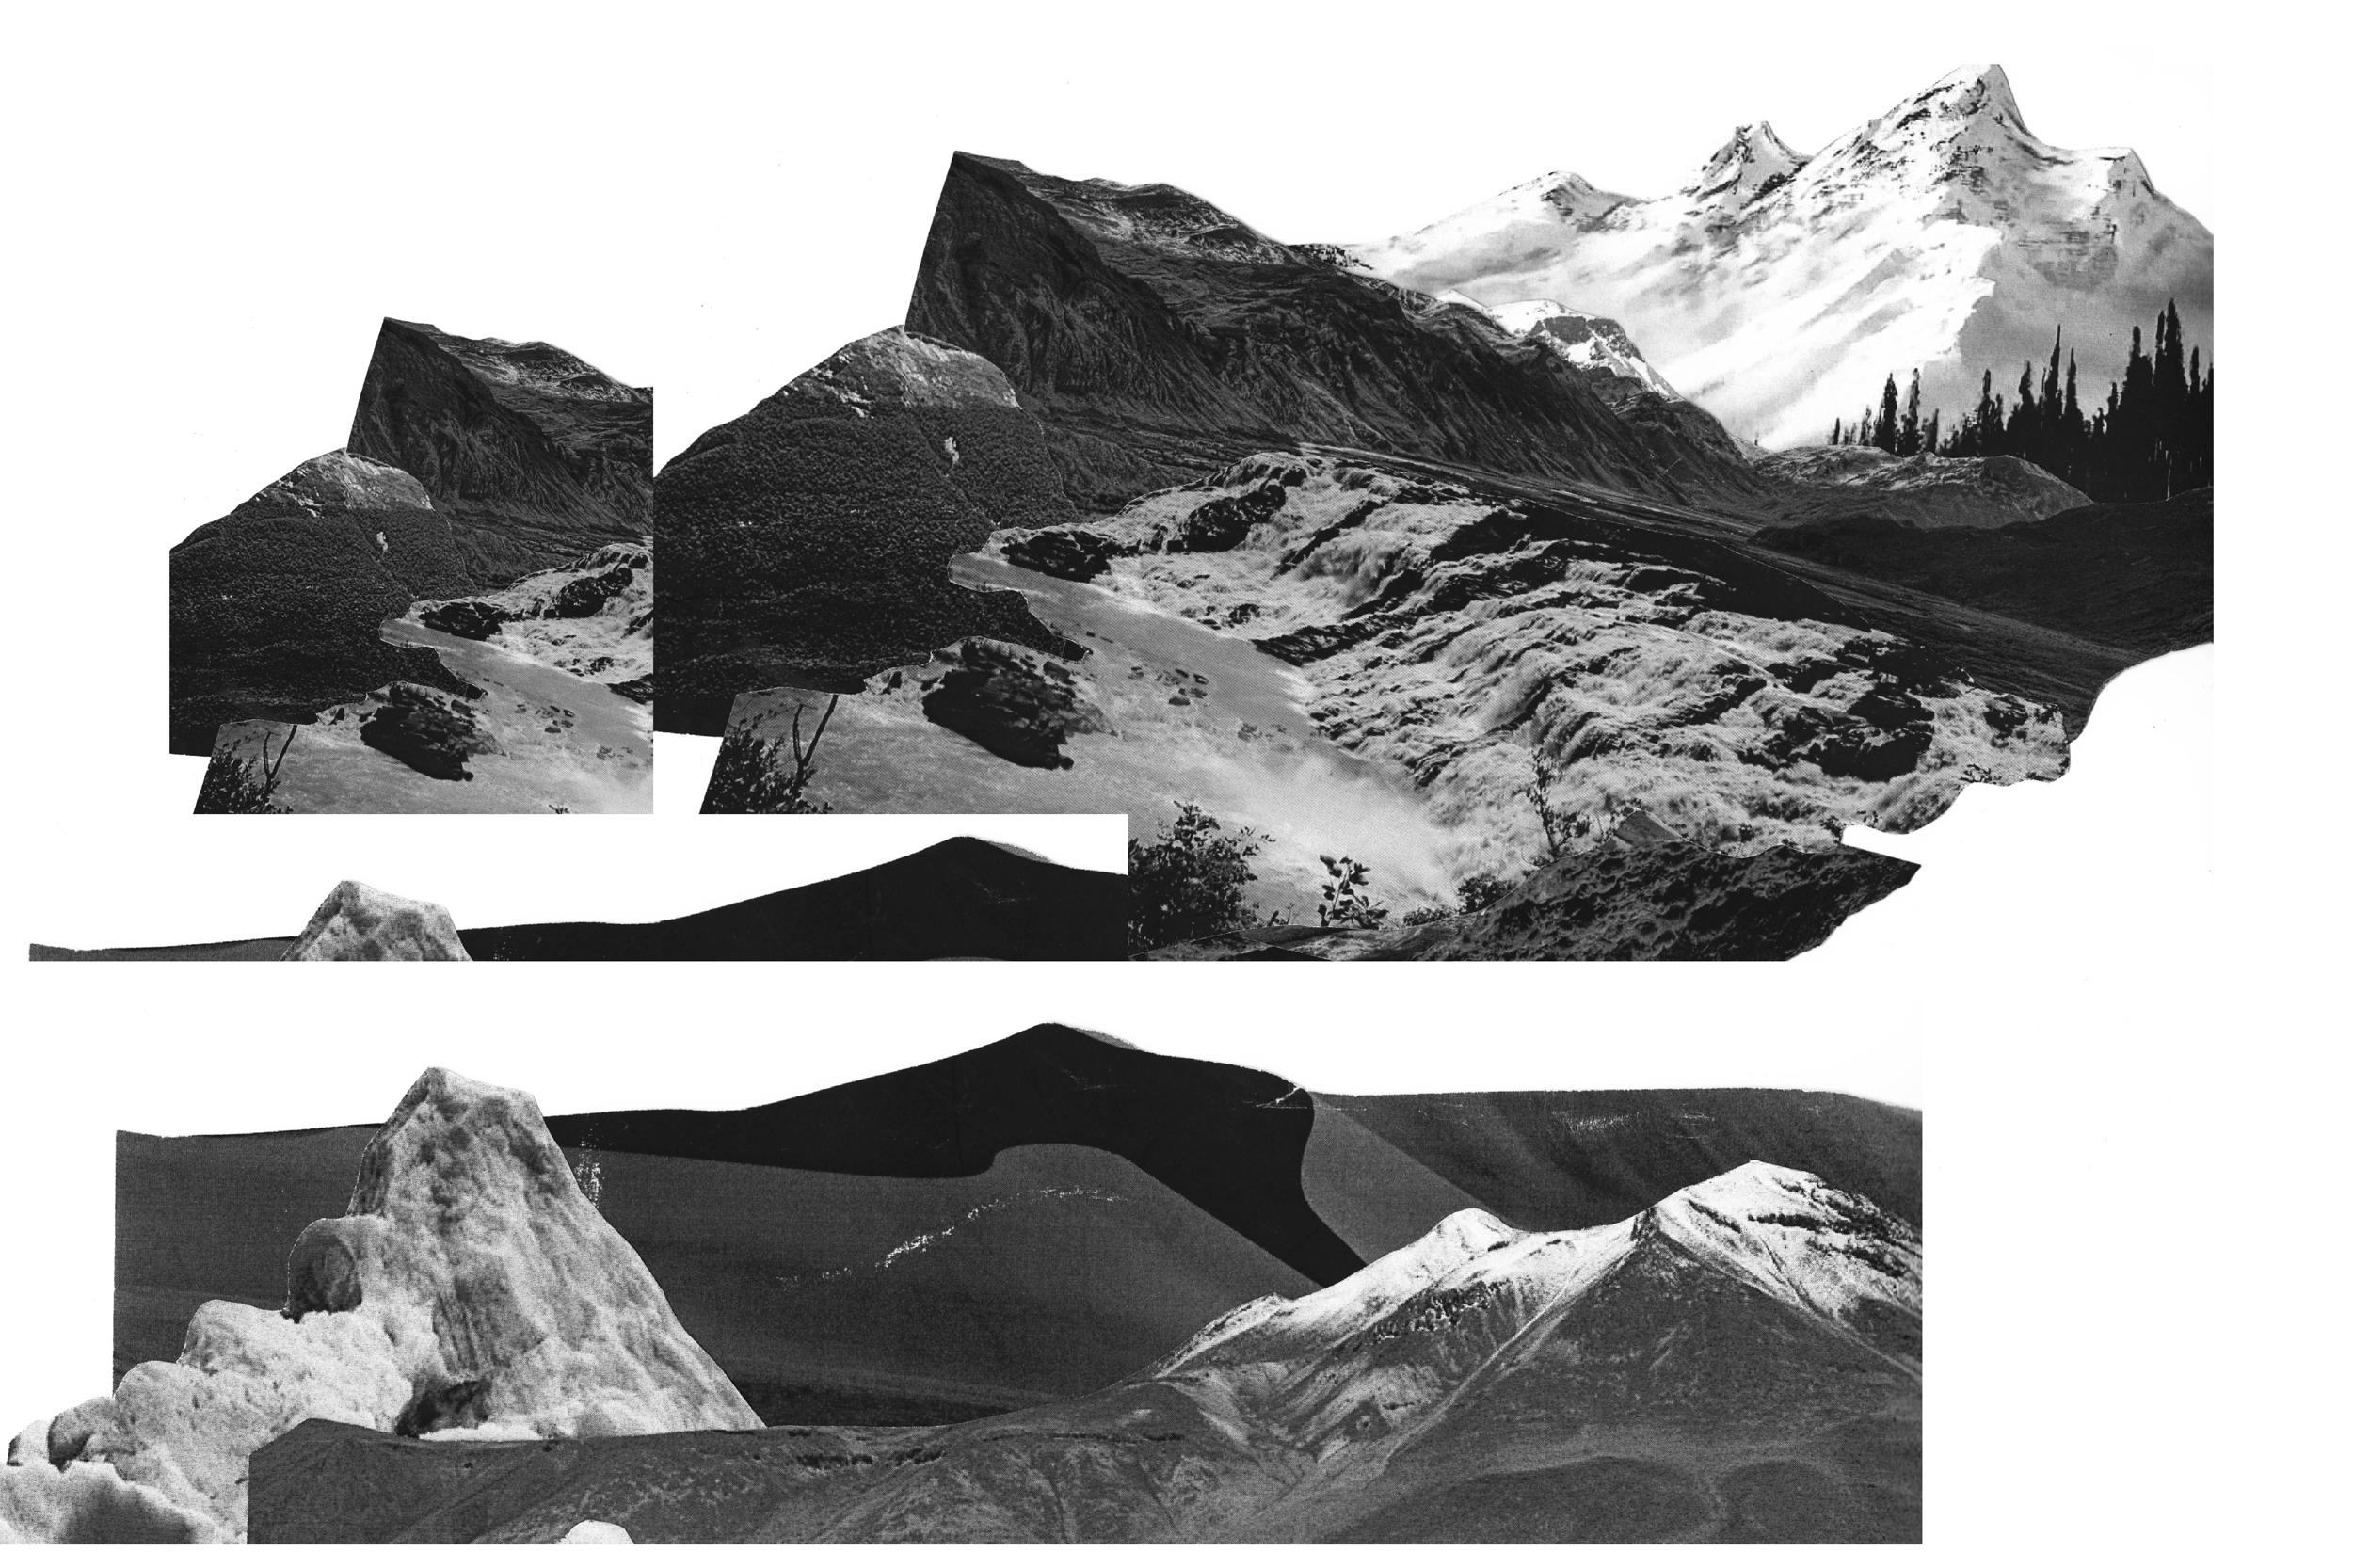 FARADAY_collage_mountainfall.jpg